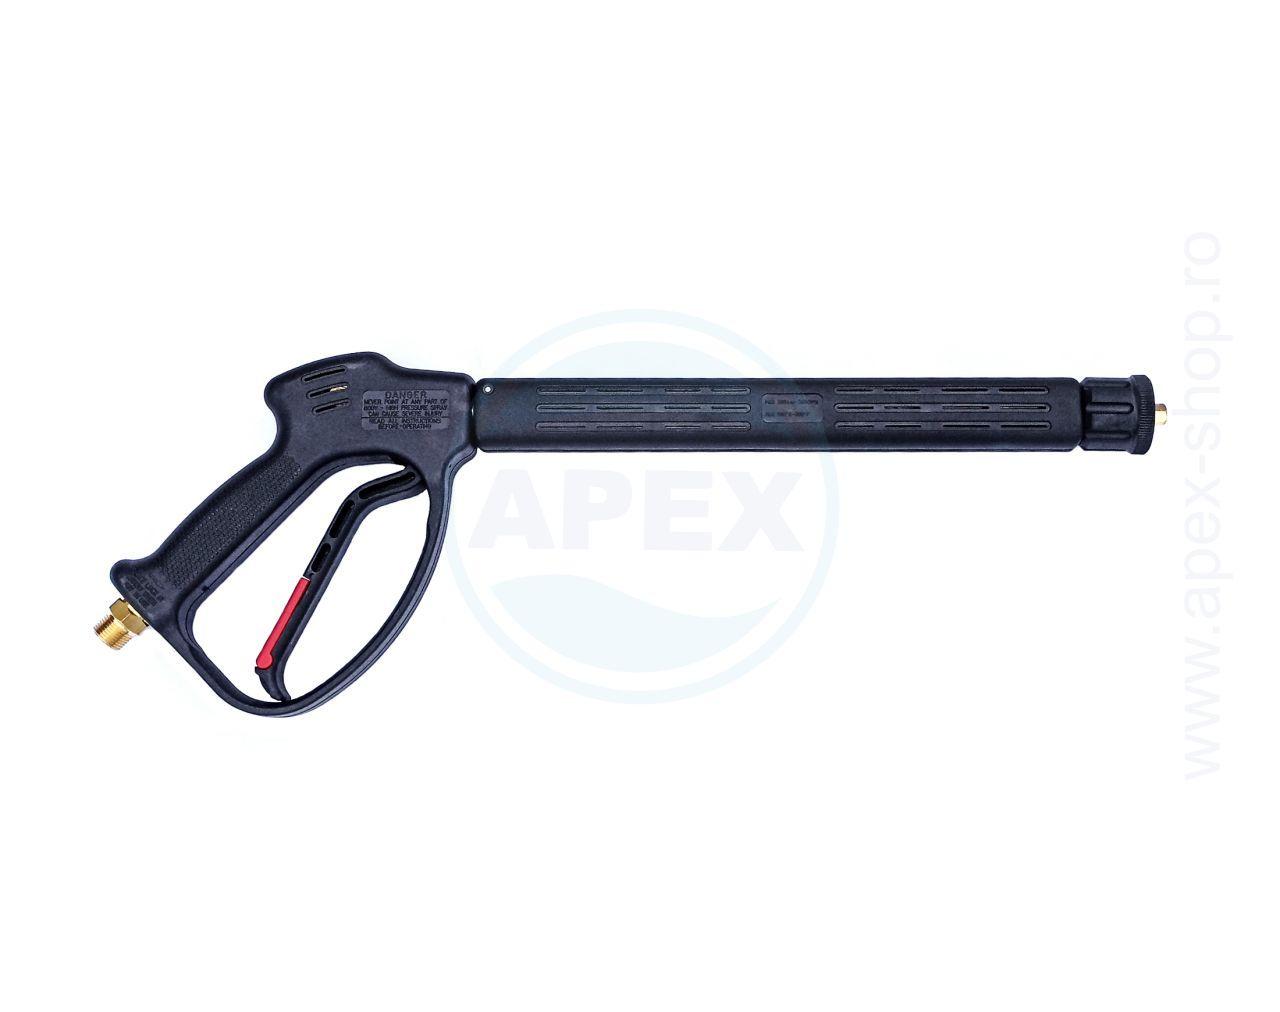 Pistol Jet RL26 cu prelungitor S3 filet M22